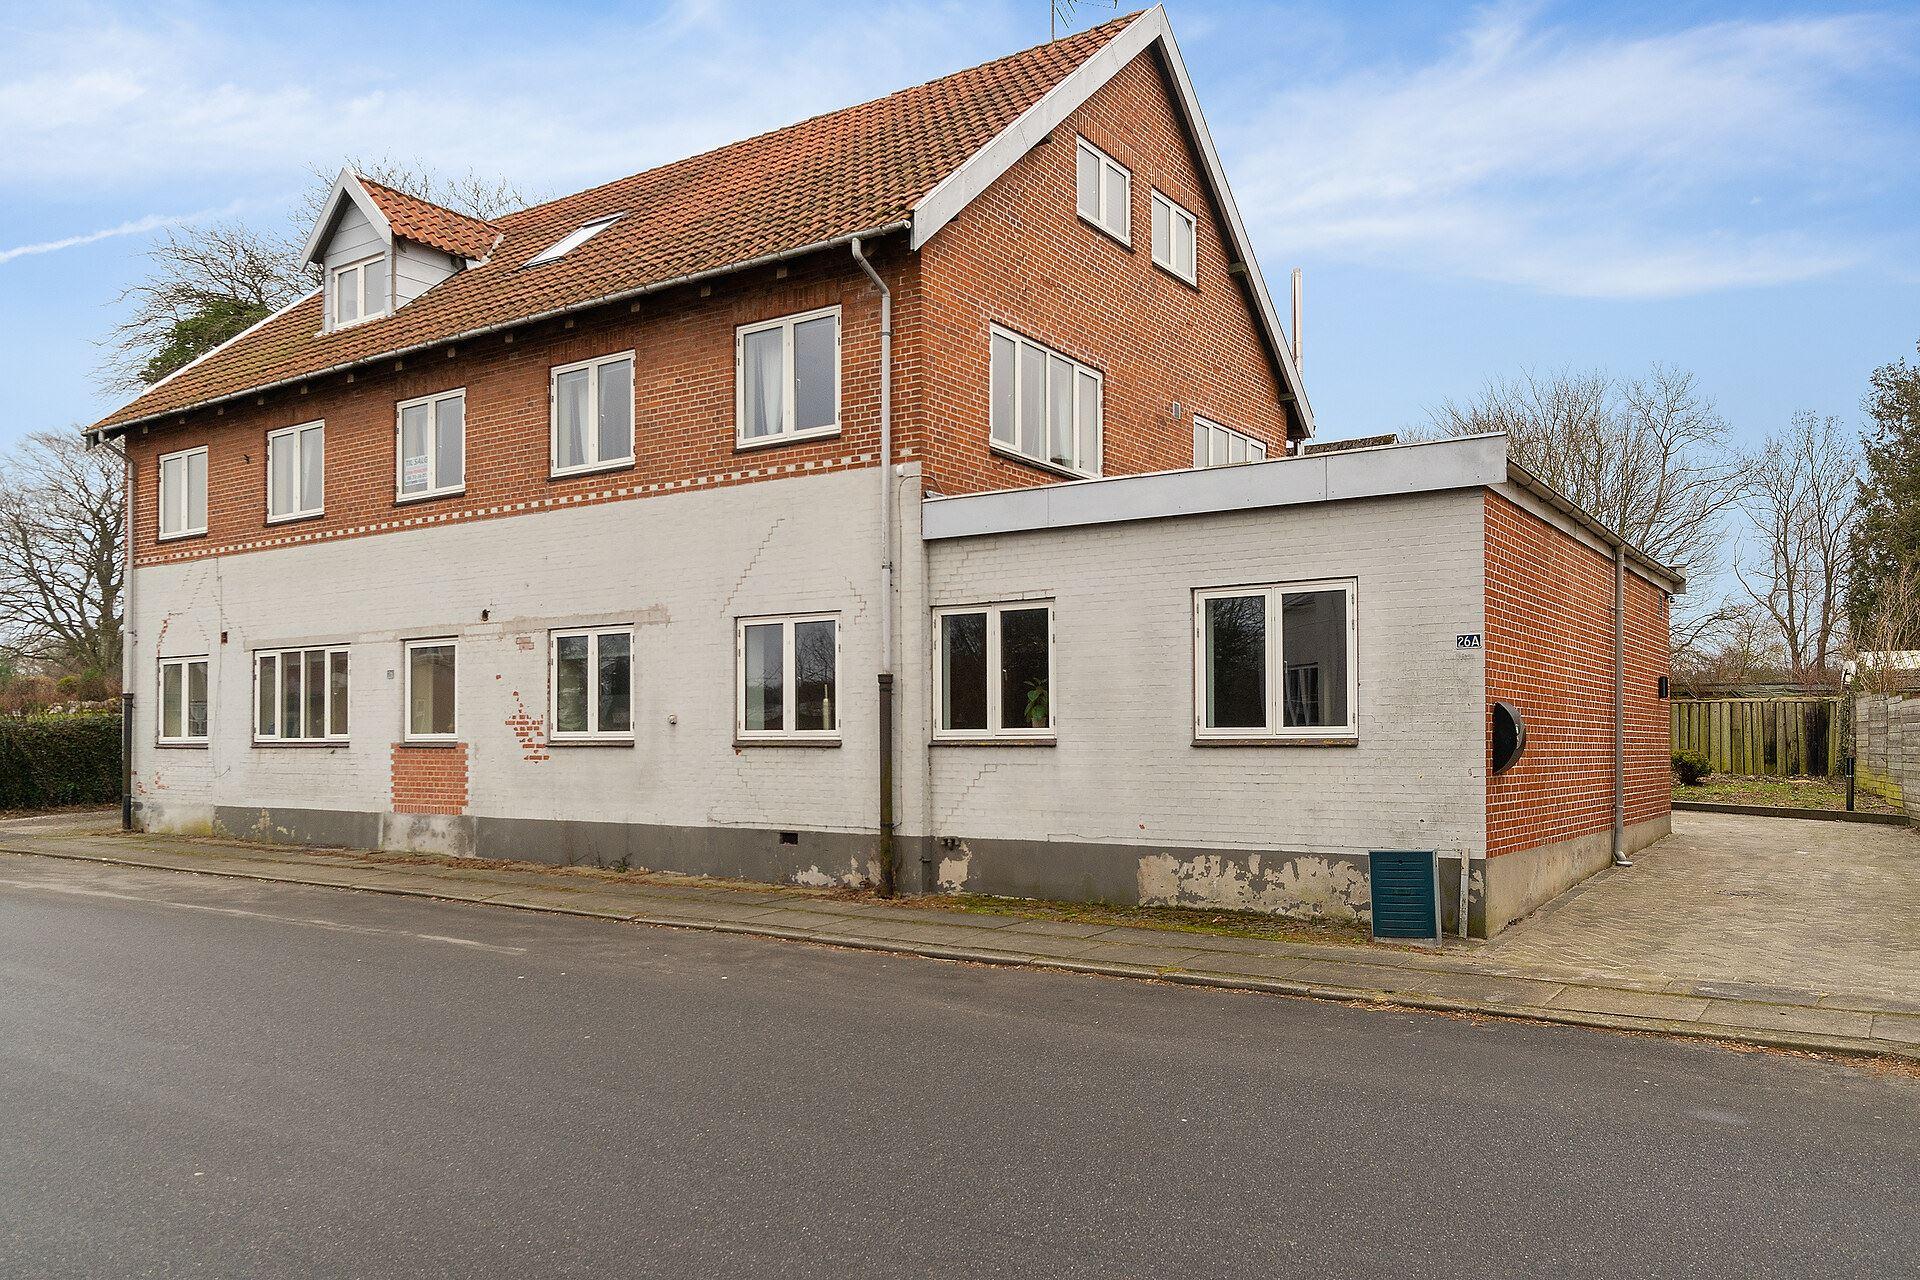 Fjellerup Bygade 26A, st., 8585 Glesborg